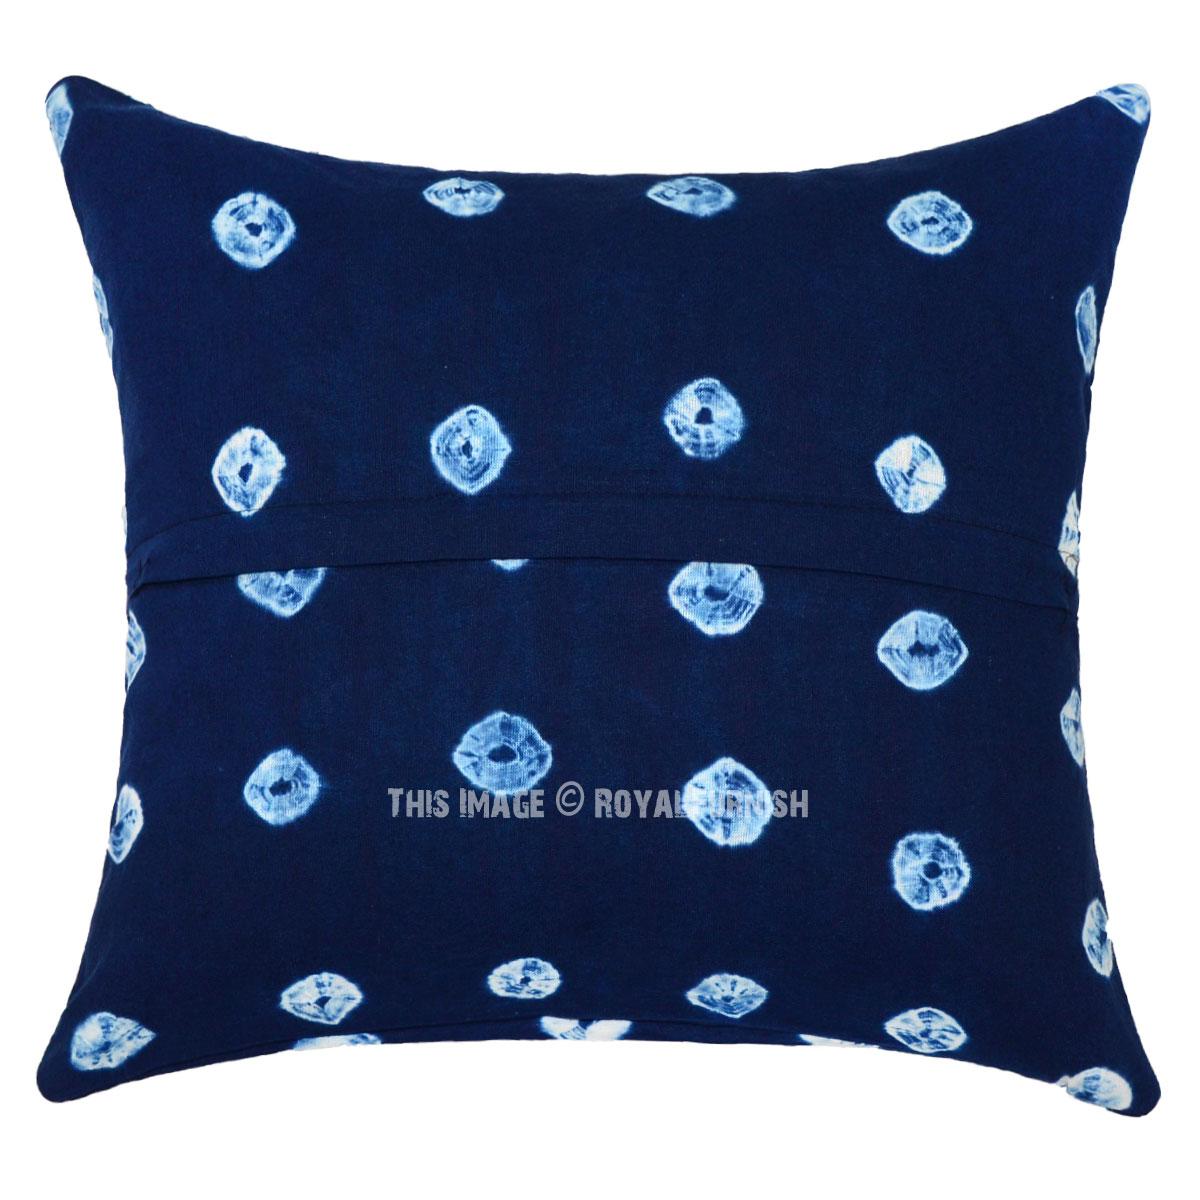 Blue Medallion Throw Pillows : Blue Medallion Outdoor Throw Pillows Square